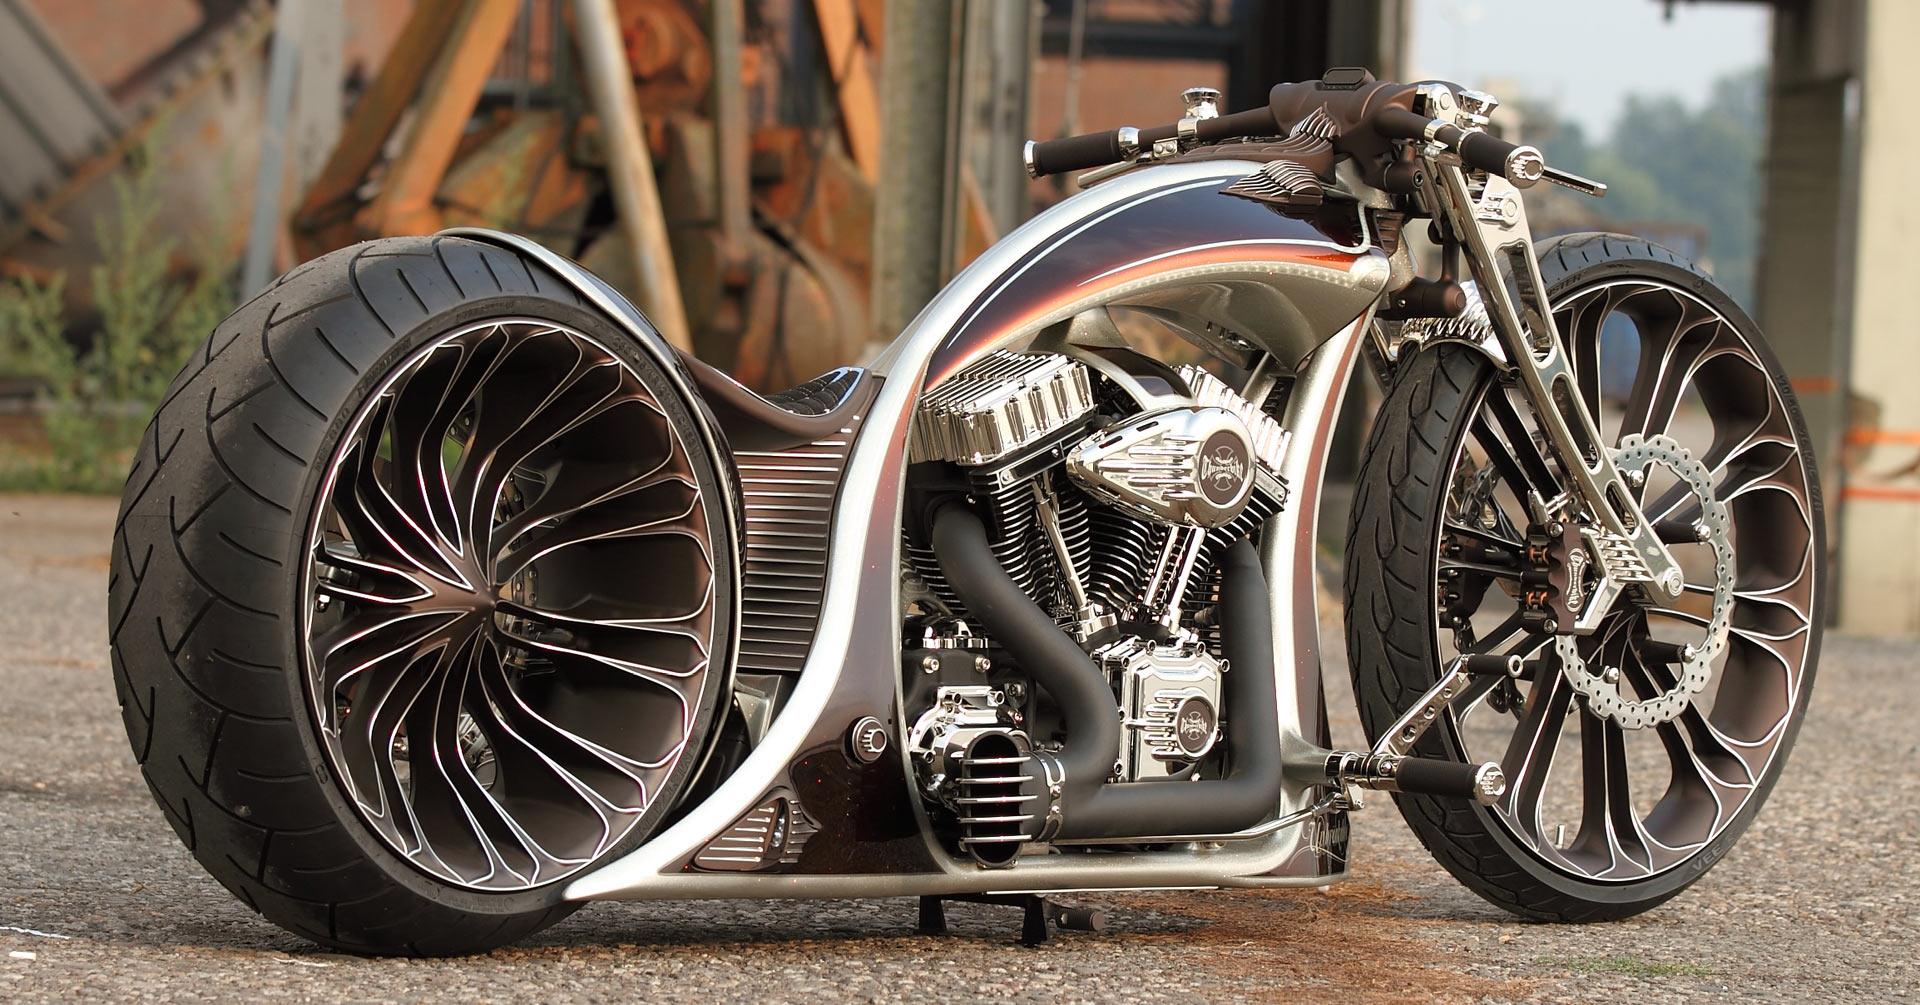 thunderbike custombikes mit custom rahmen komplett aufbauten. Black Bedroom Furniture Sets. Home Design Ideas